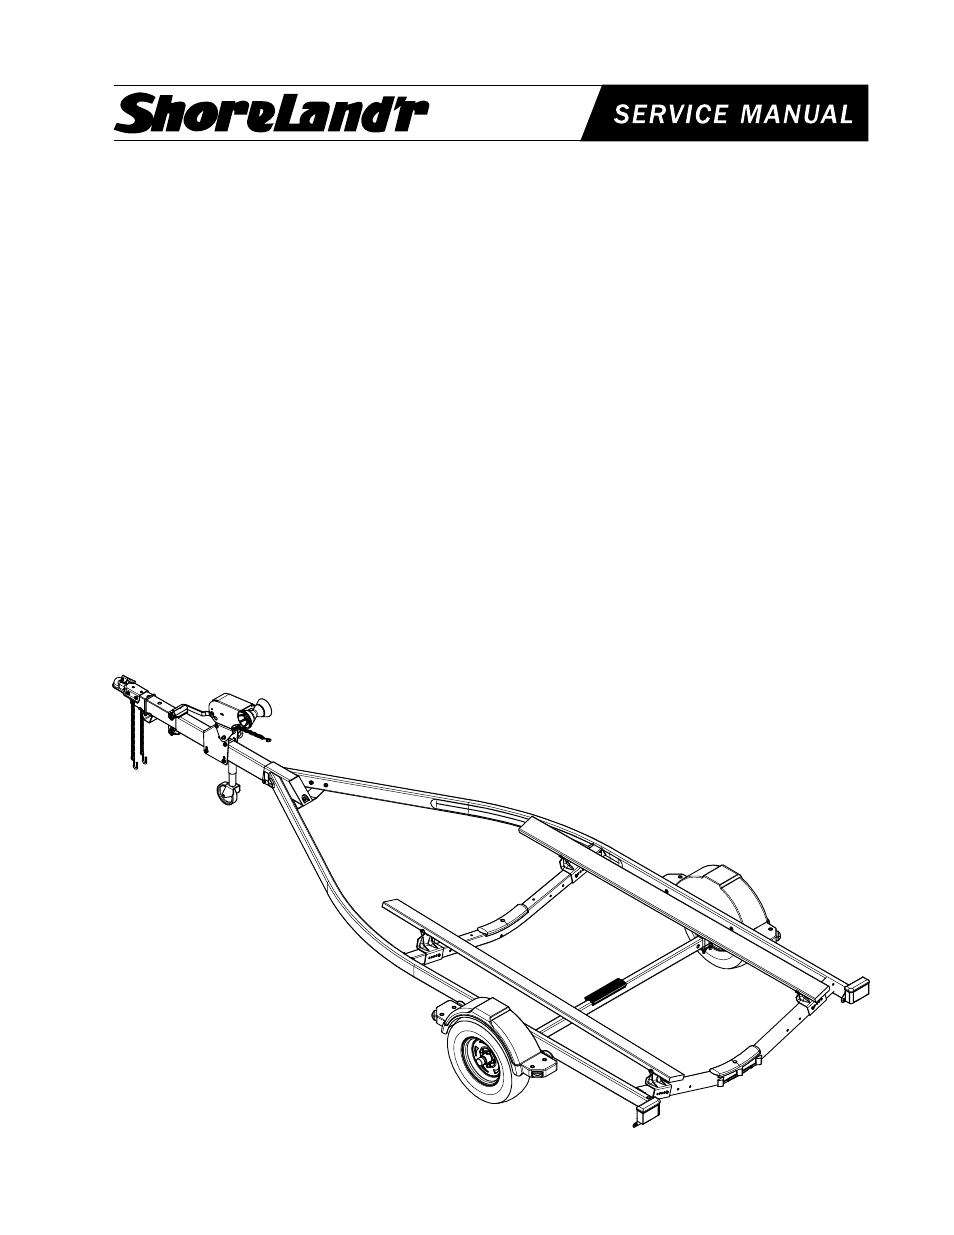 Shorelandr sr pwv1824 user manual 4 pages geenschuldenfo Image collections